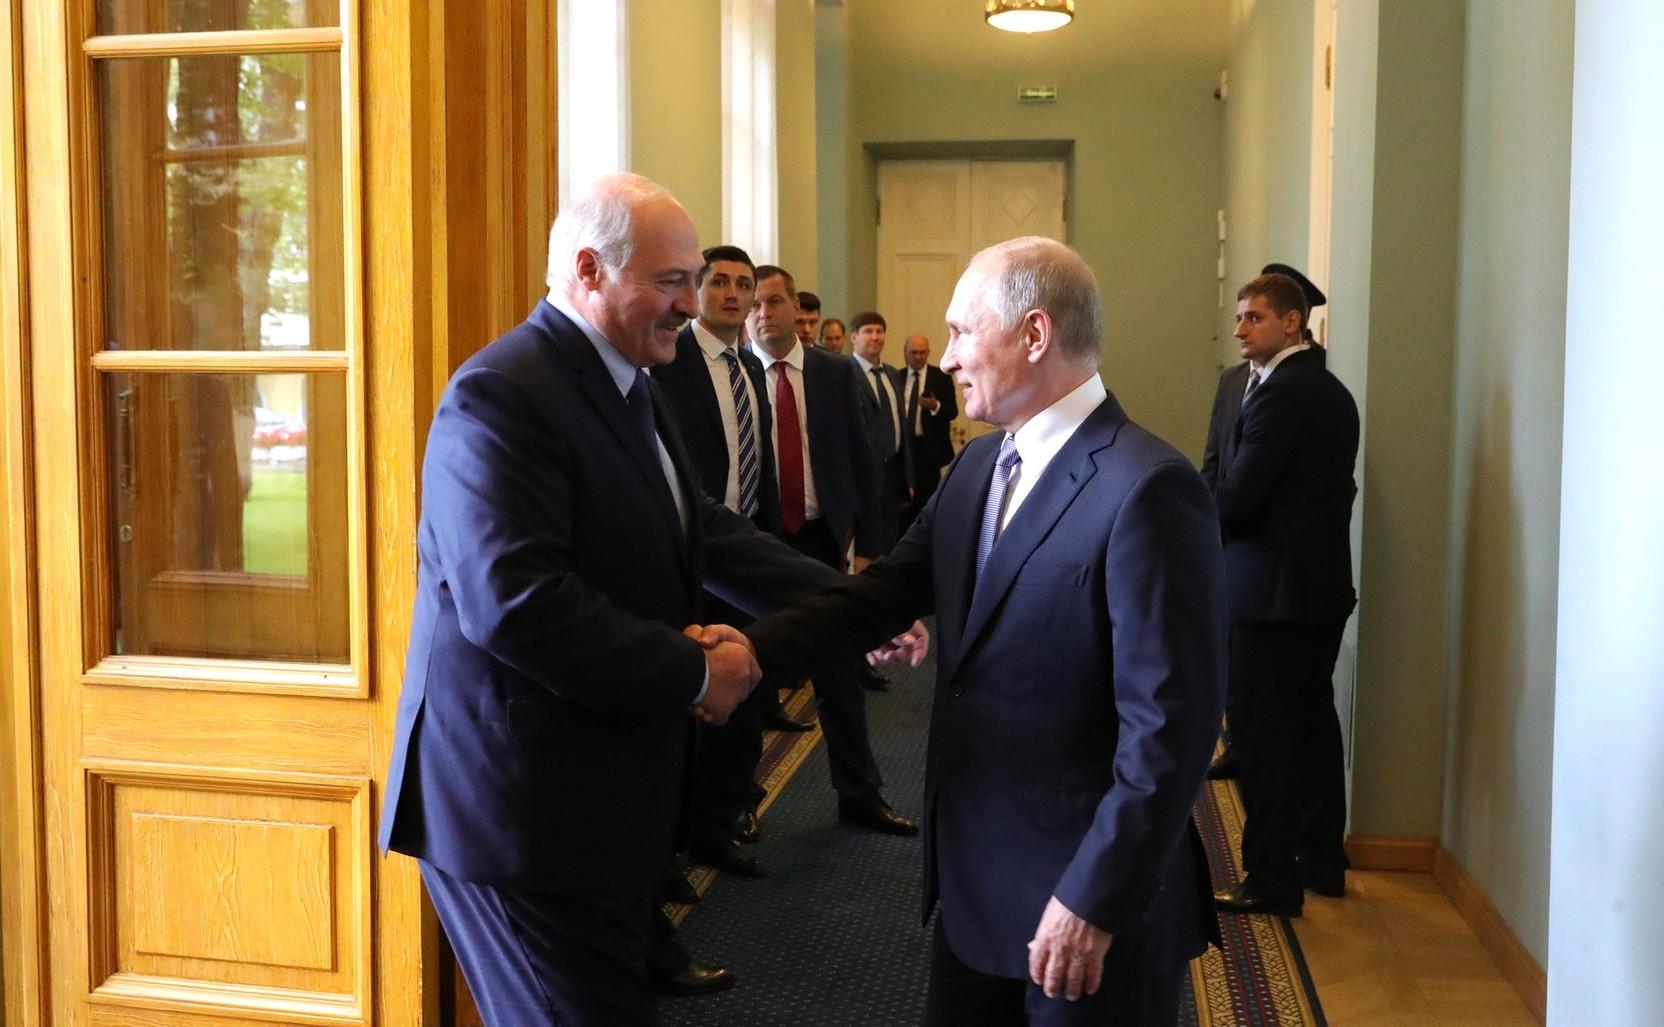 Путин и Лукашенко обсудили Нагорный Карабах